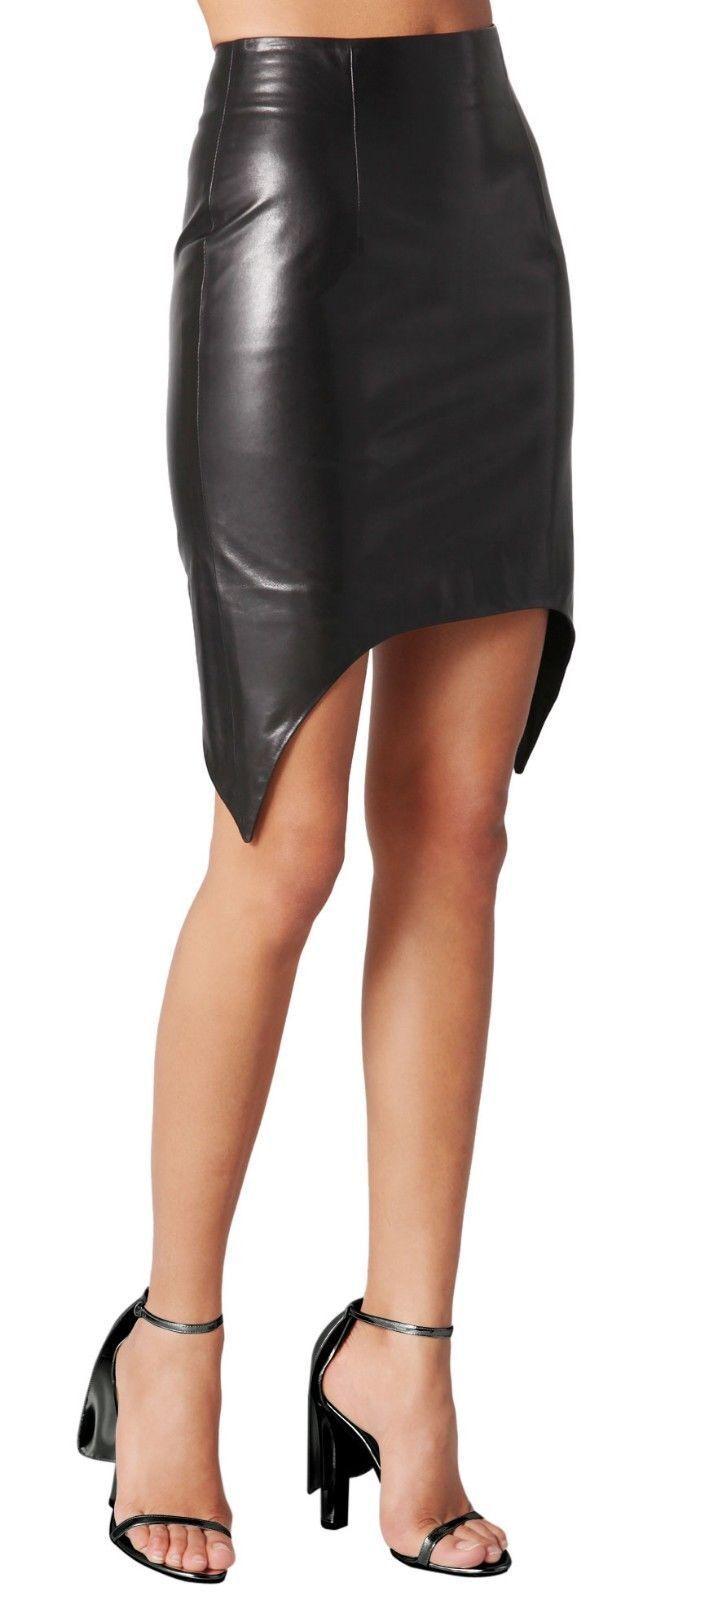 Womens Leather Skirts Girls Club Party Wear Designer Asymmetrical Hot Mini Skirt